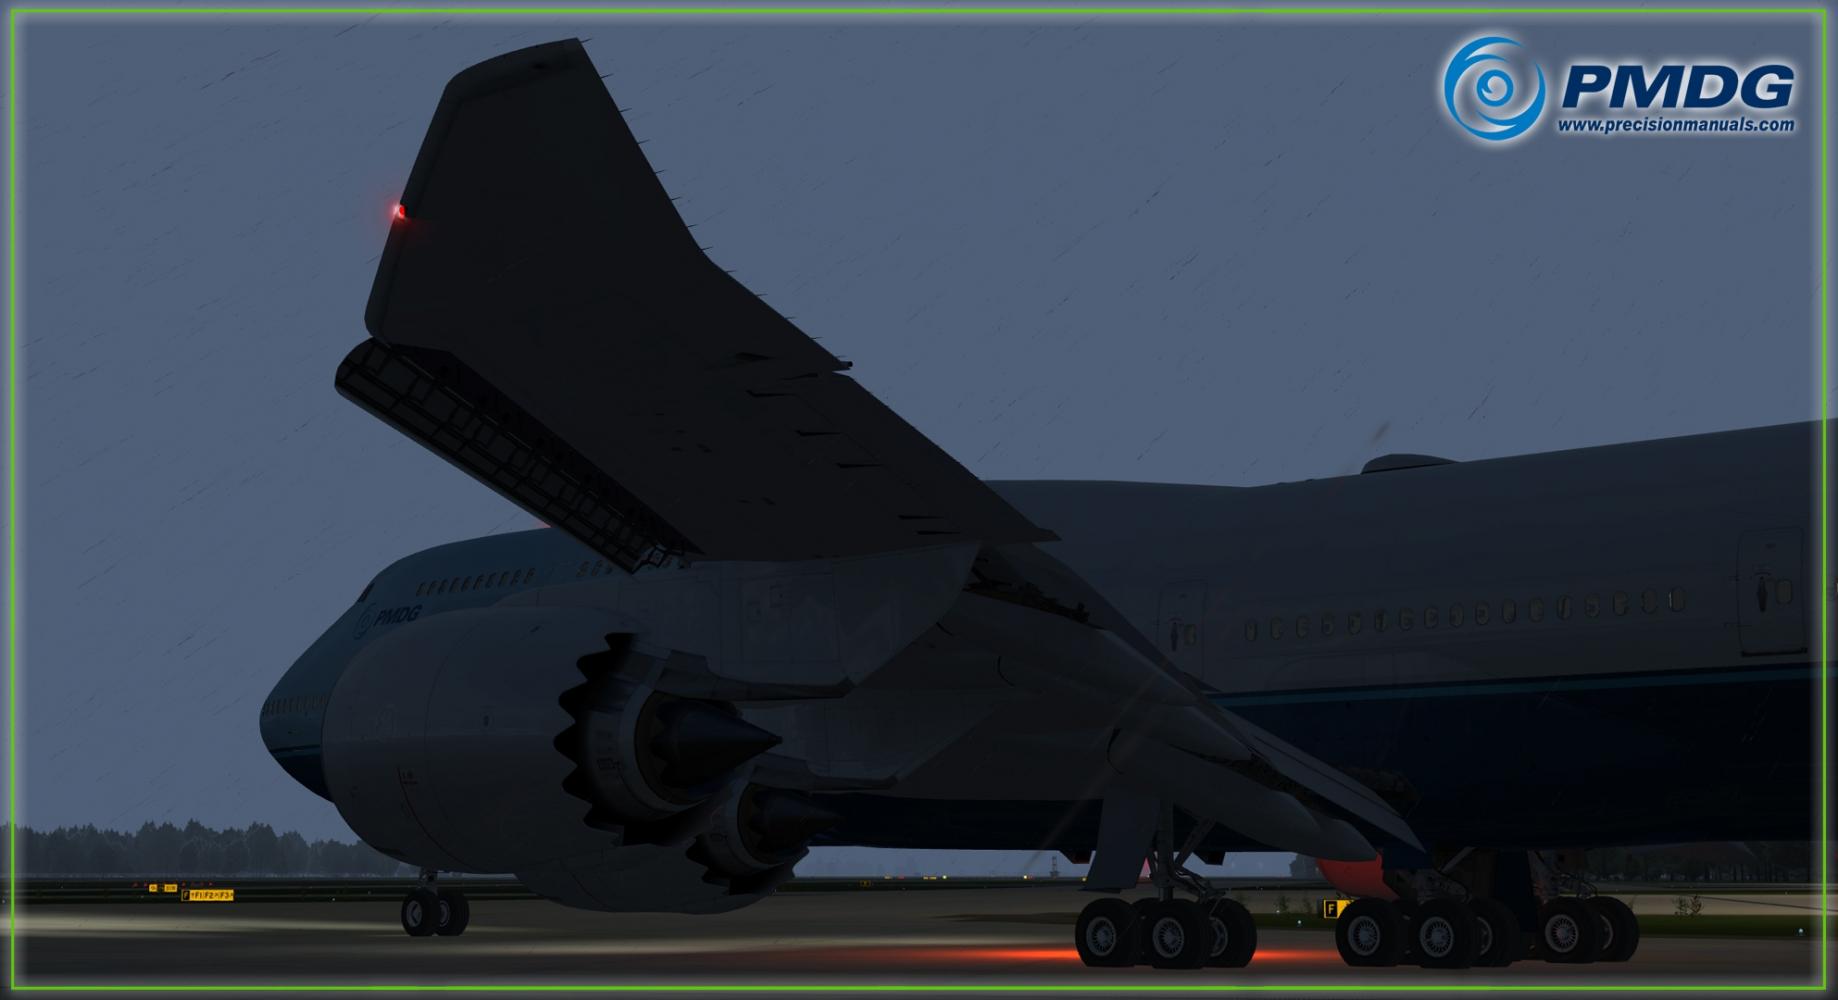 PMDG_748_Taxiing.jpg